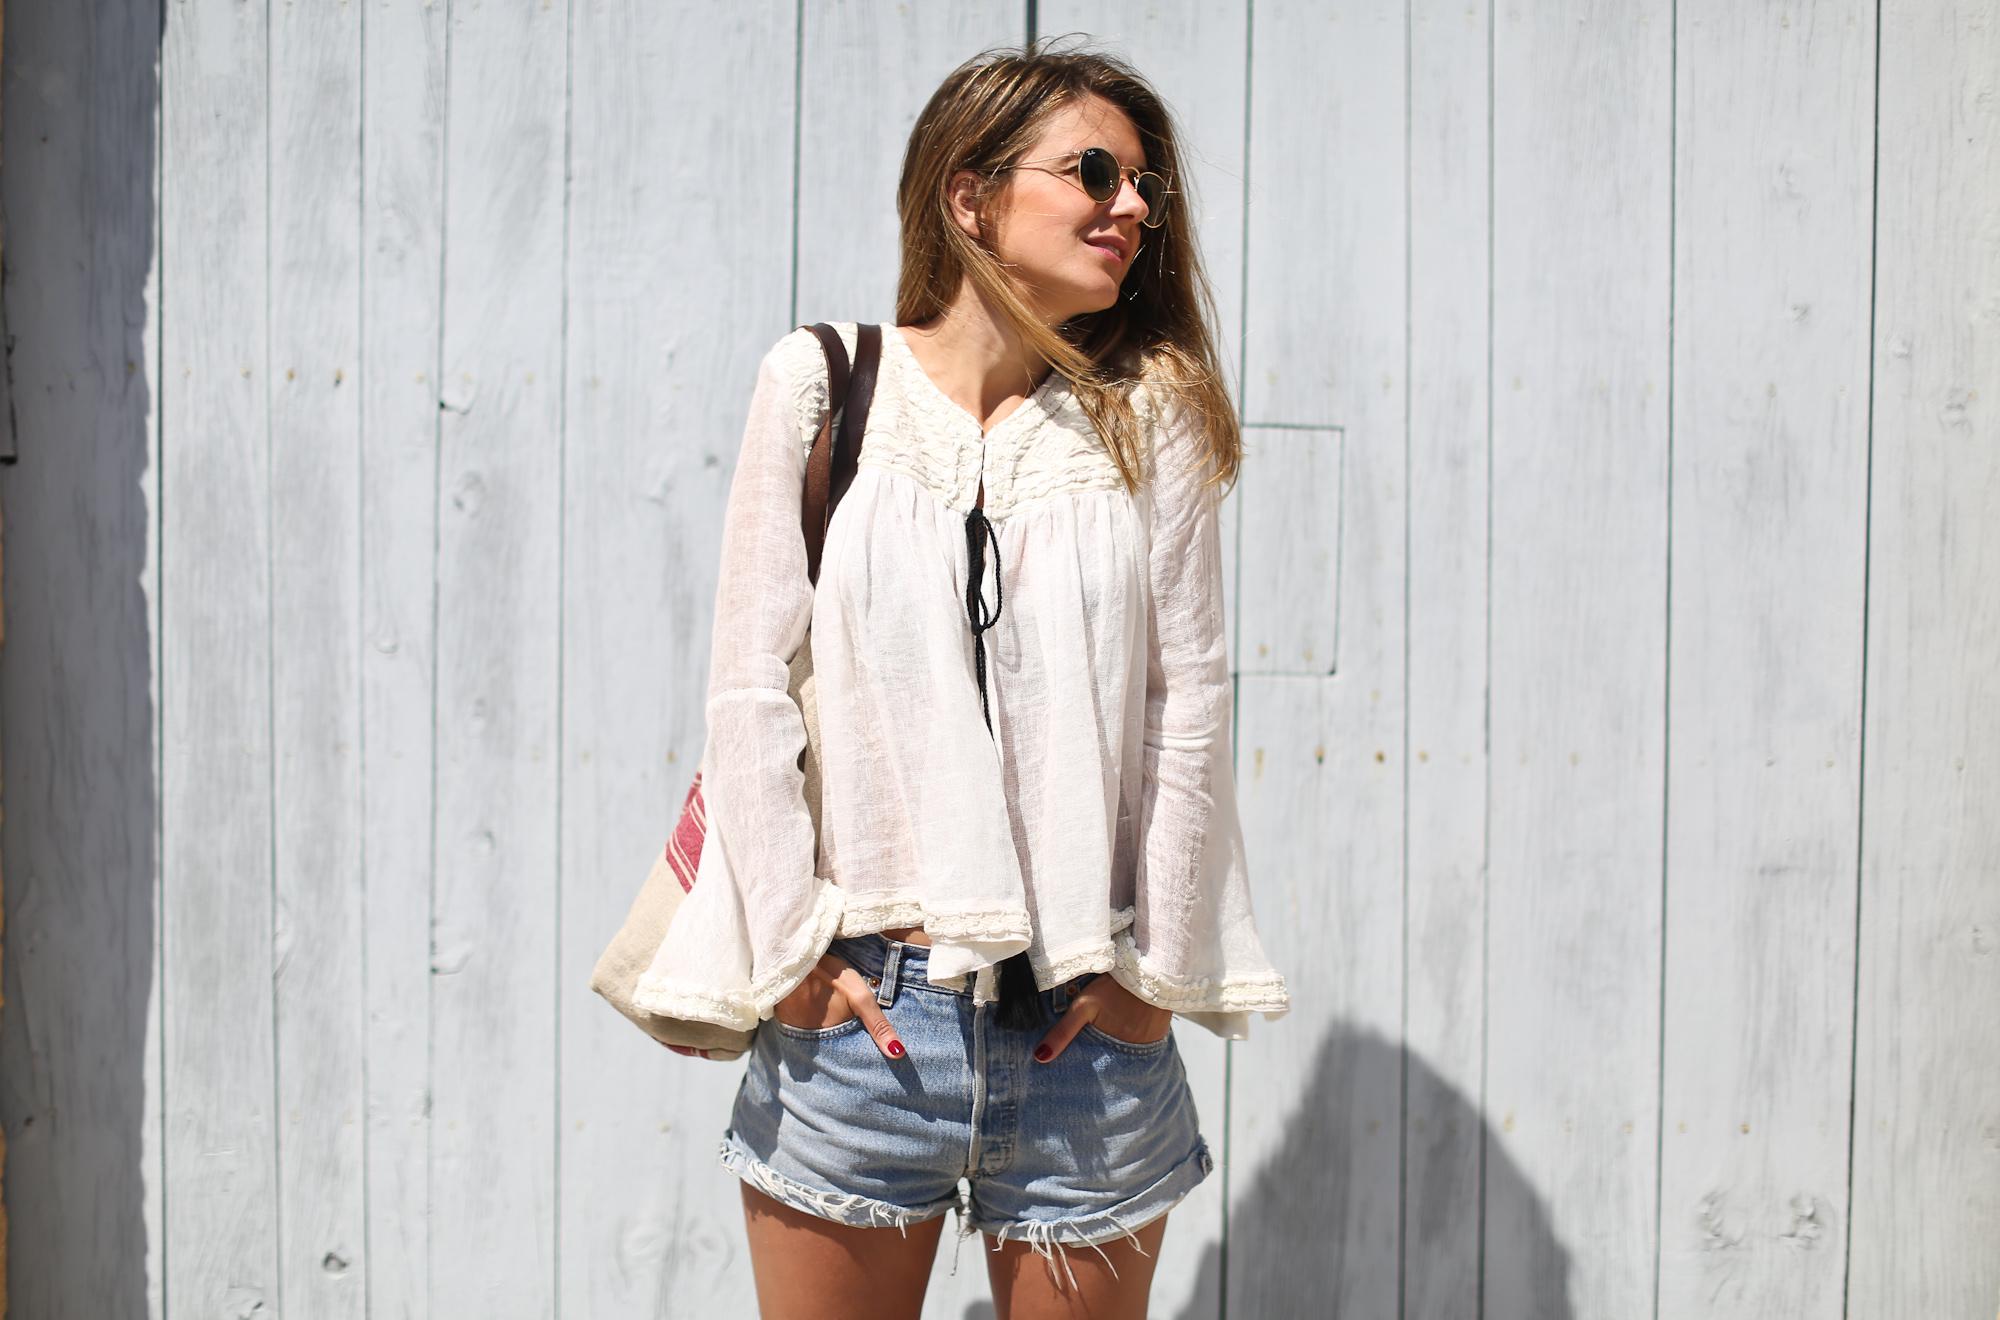 Clochet_streetstyle_zara_embroided_linen_kimonojacket_vintagelevis501shorts-8